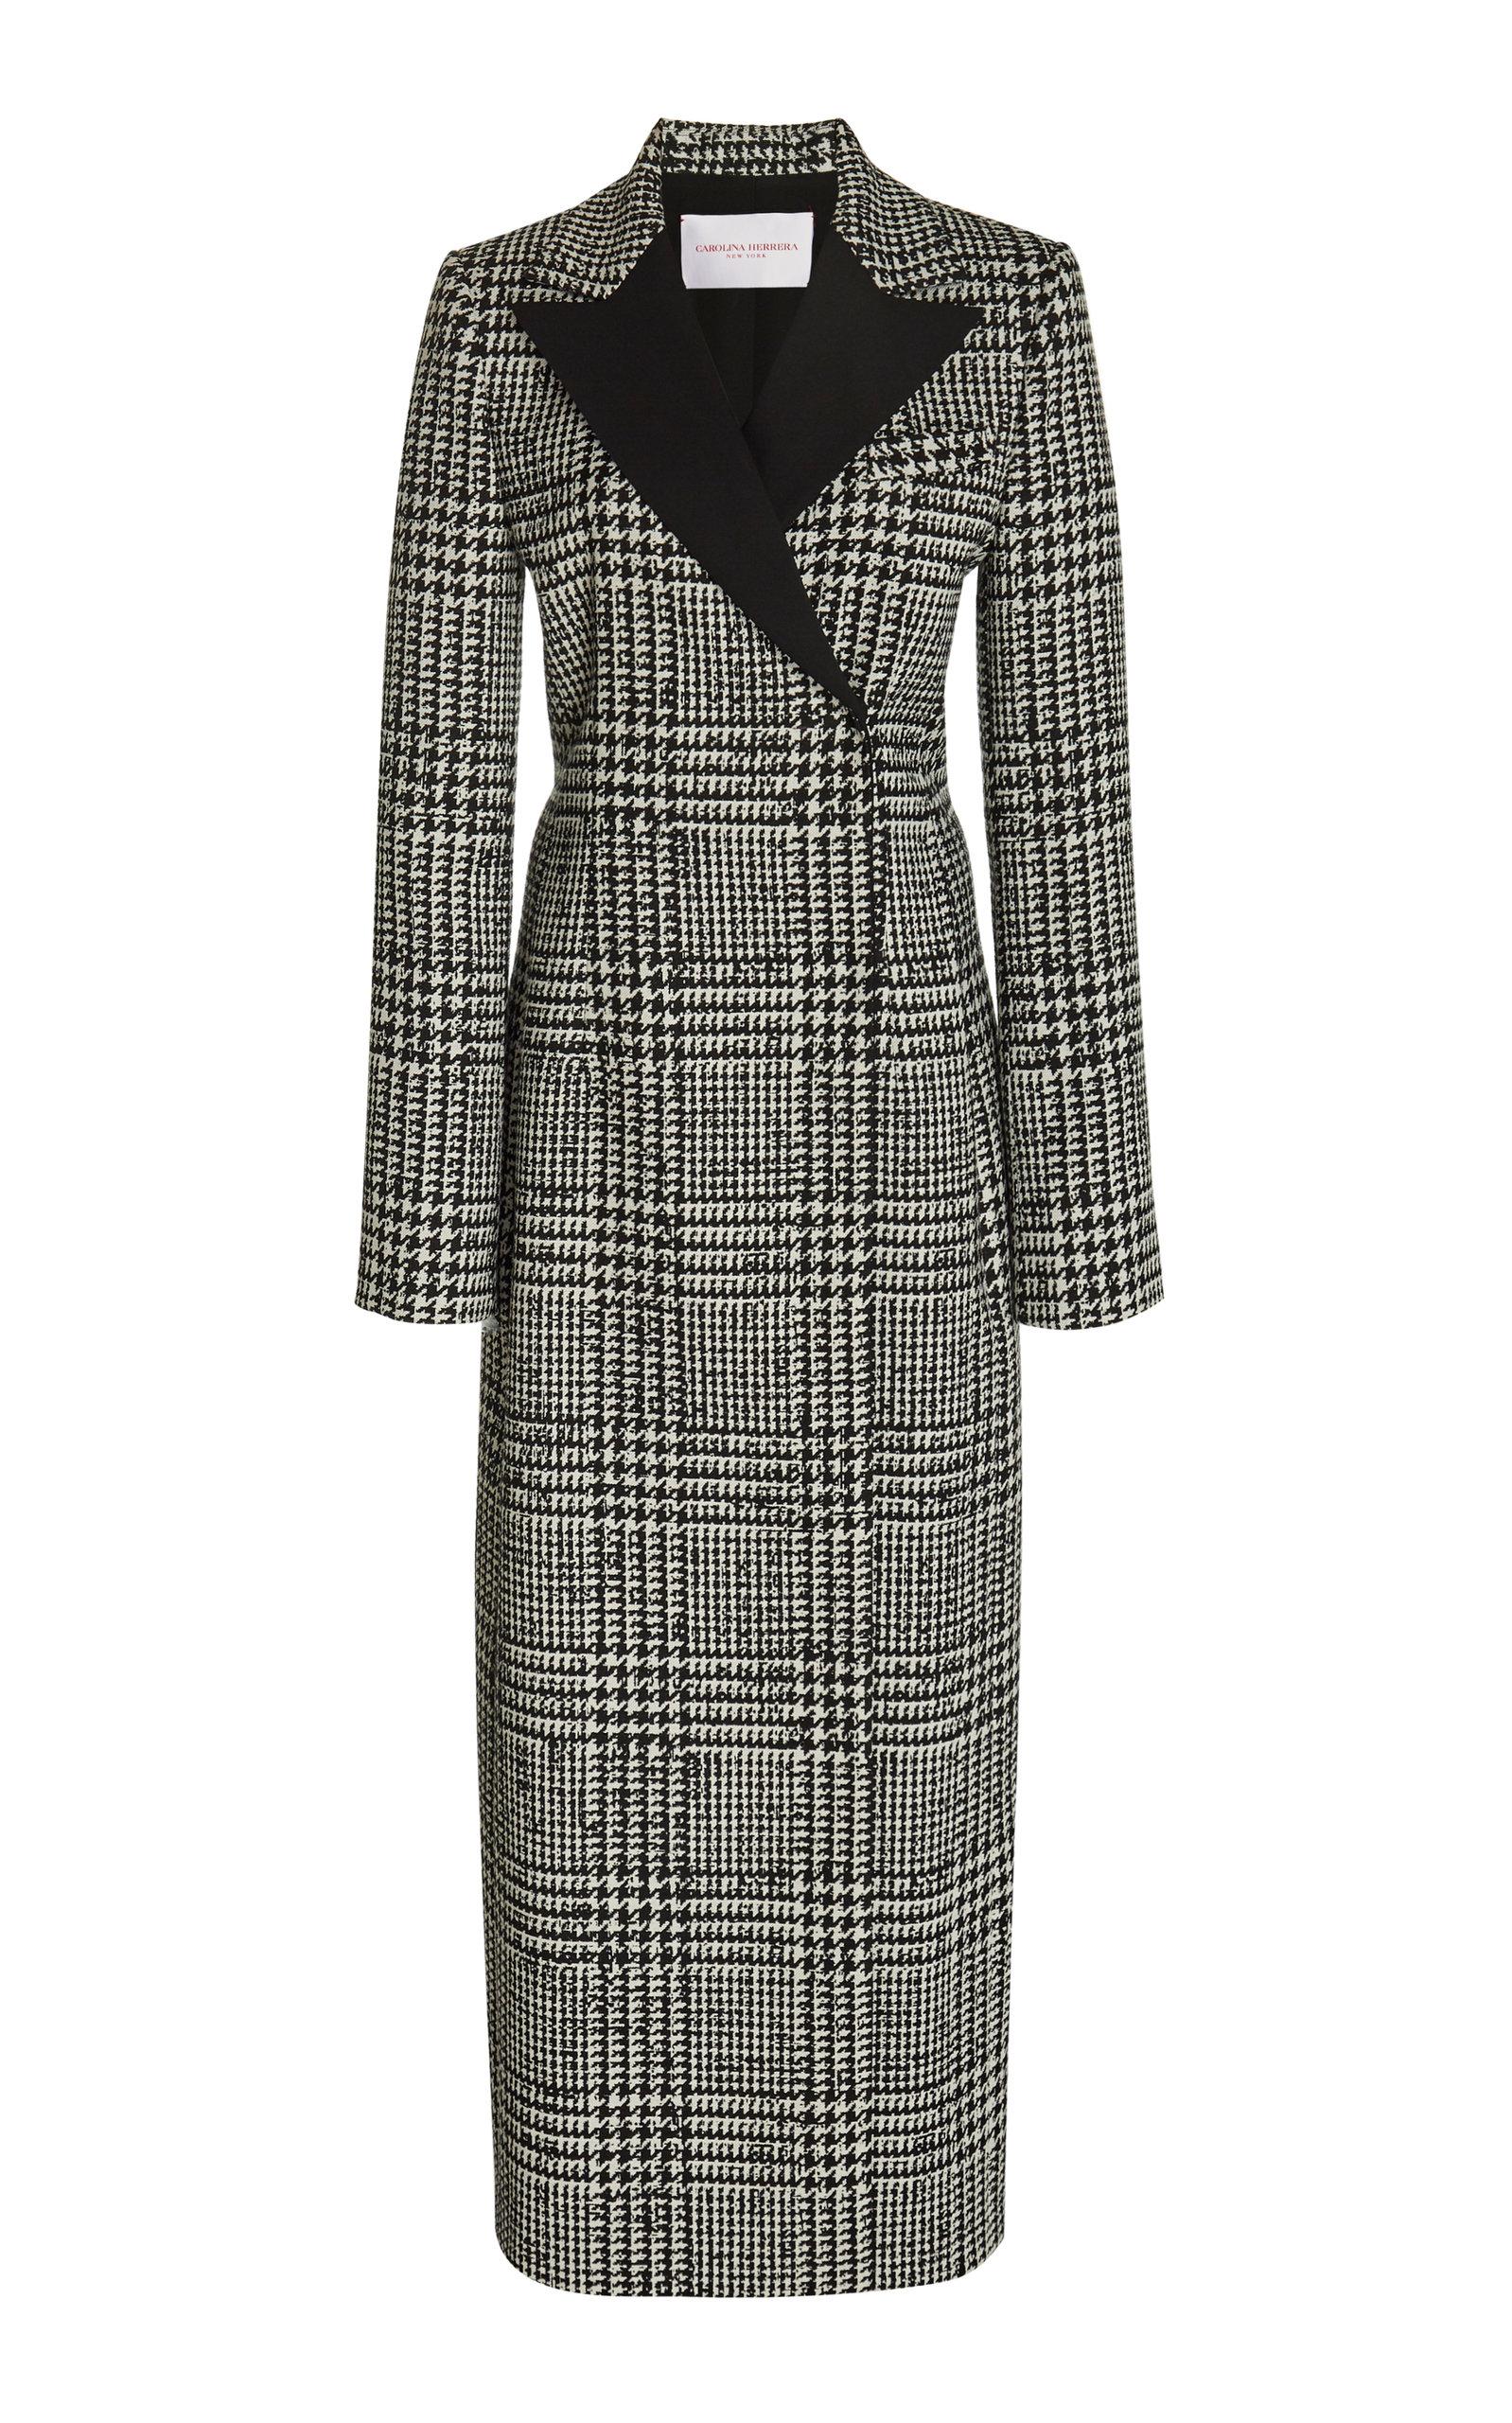 3253cd3279d1 Collared Prince Of Wales Checked Silk-Wool Coat by Carolina Herrera ...